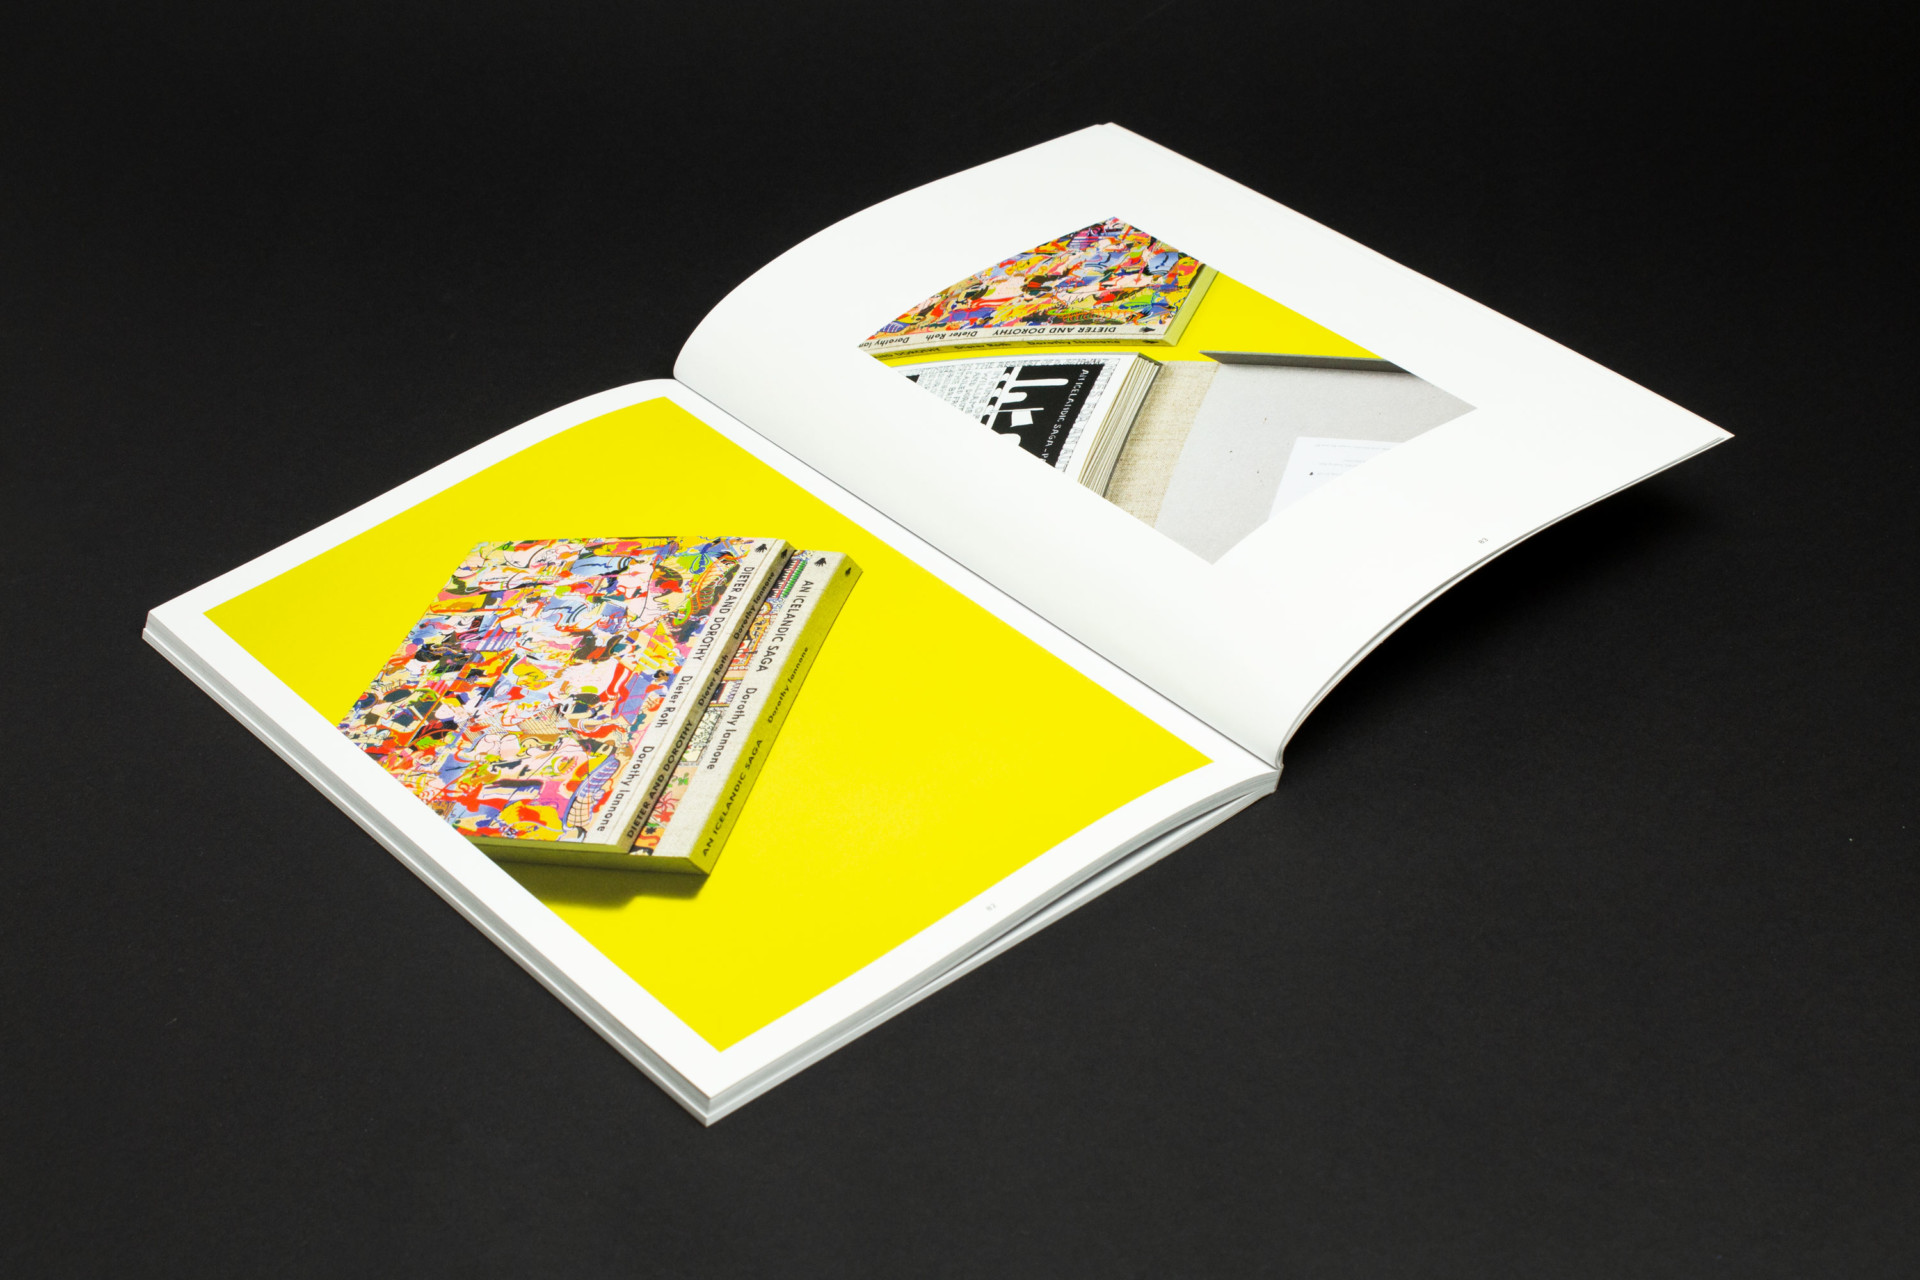 BKVK Publikationen / Publications